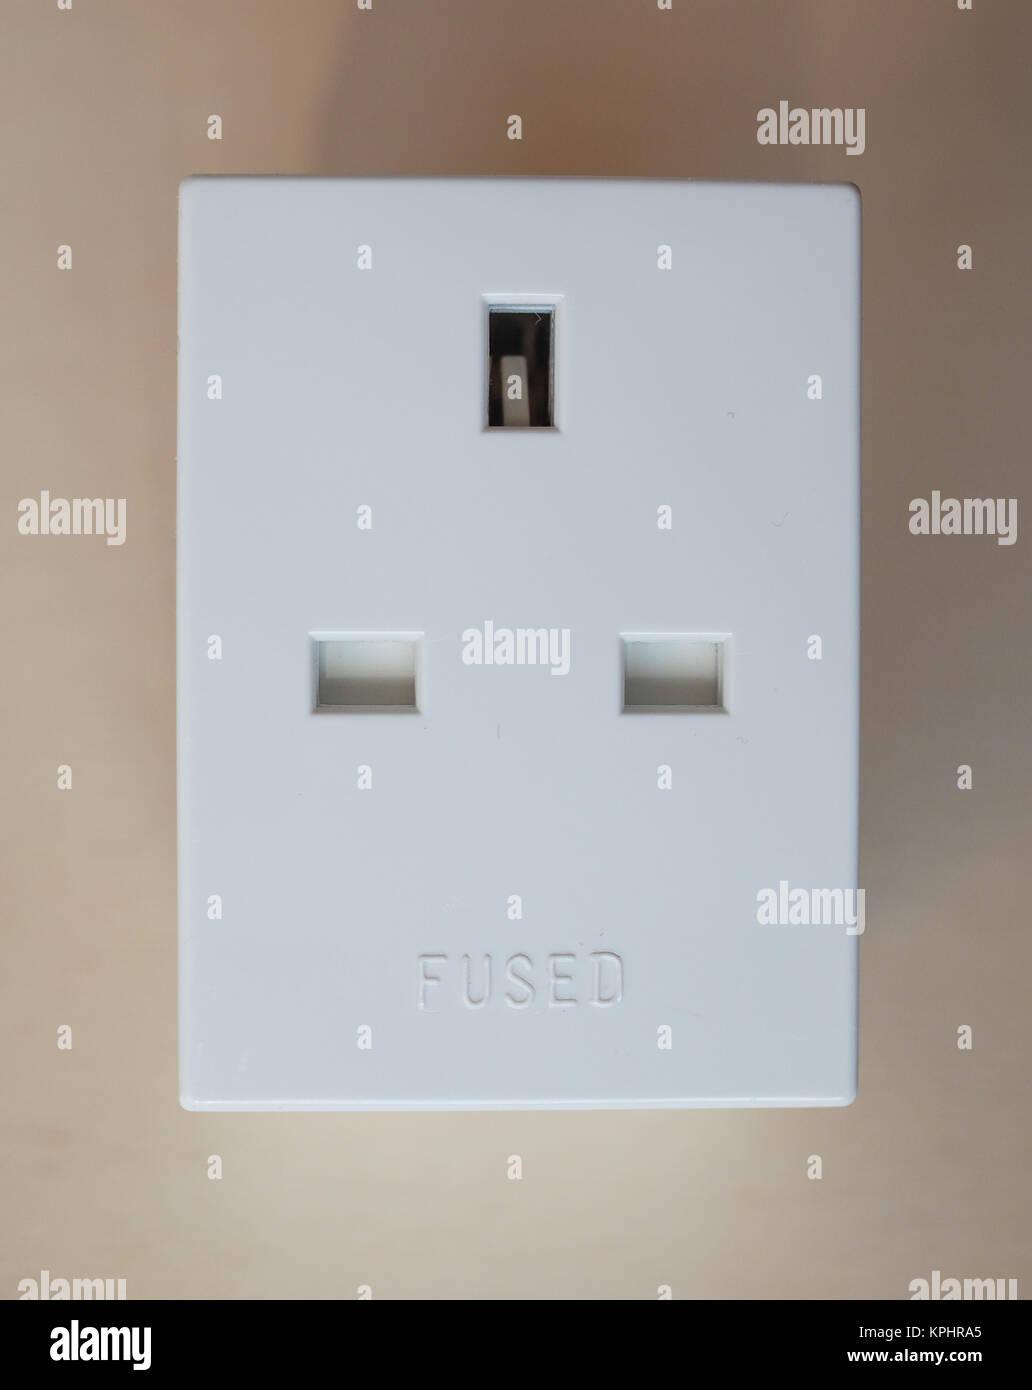 Bs 1363 Wiring Diagram Library Wall Socket Standard British Power Plug Stock Image